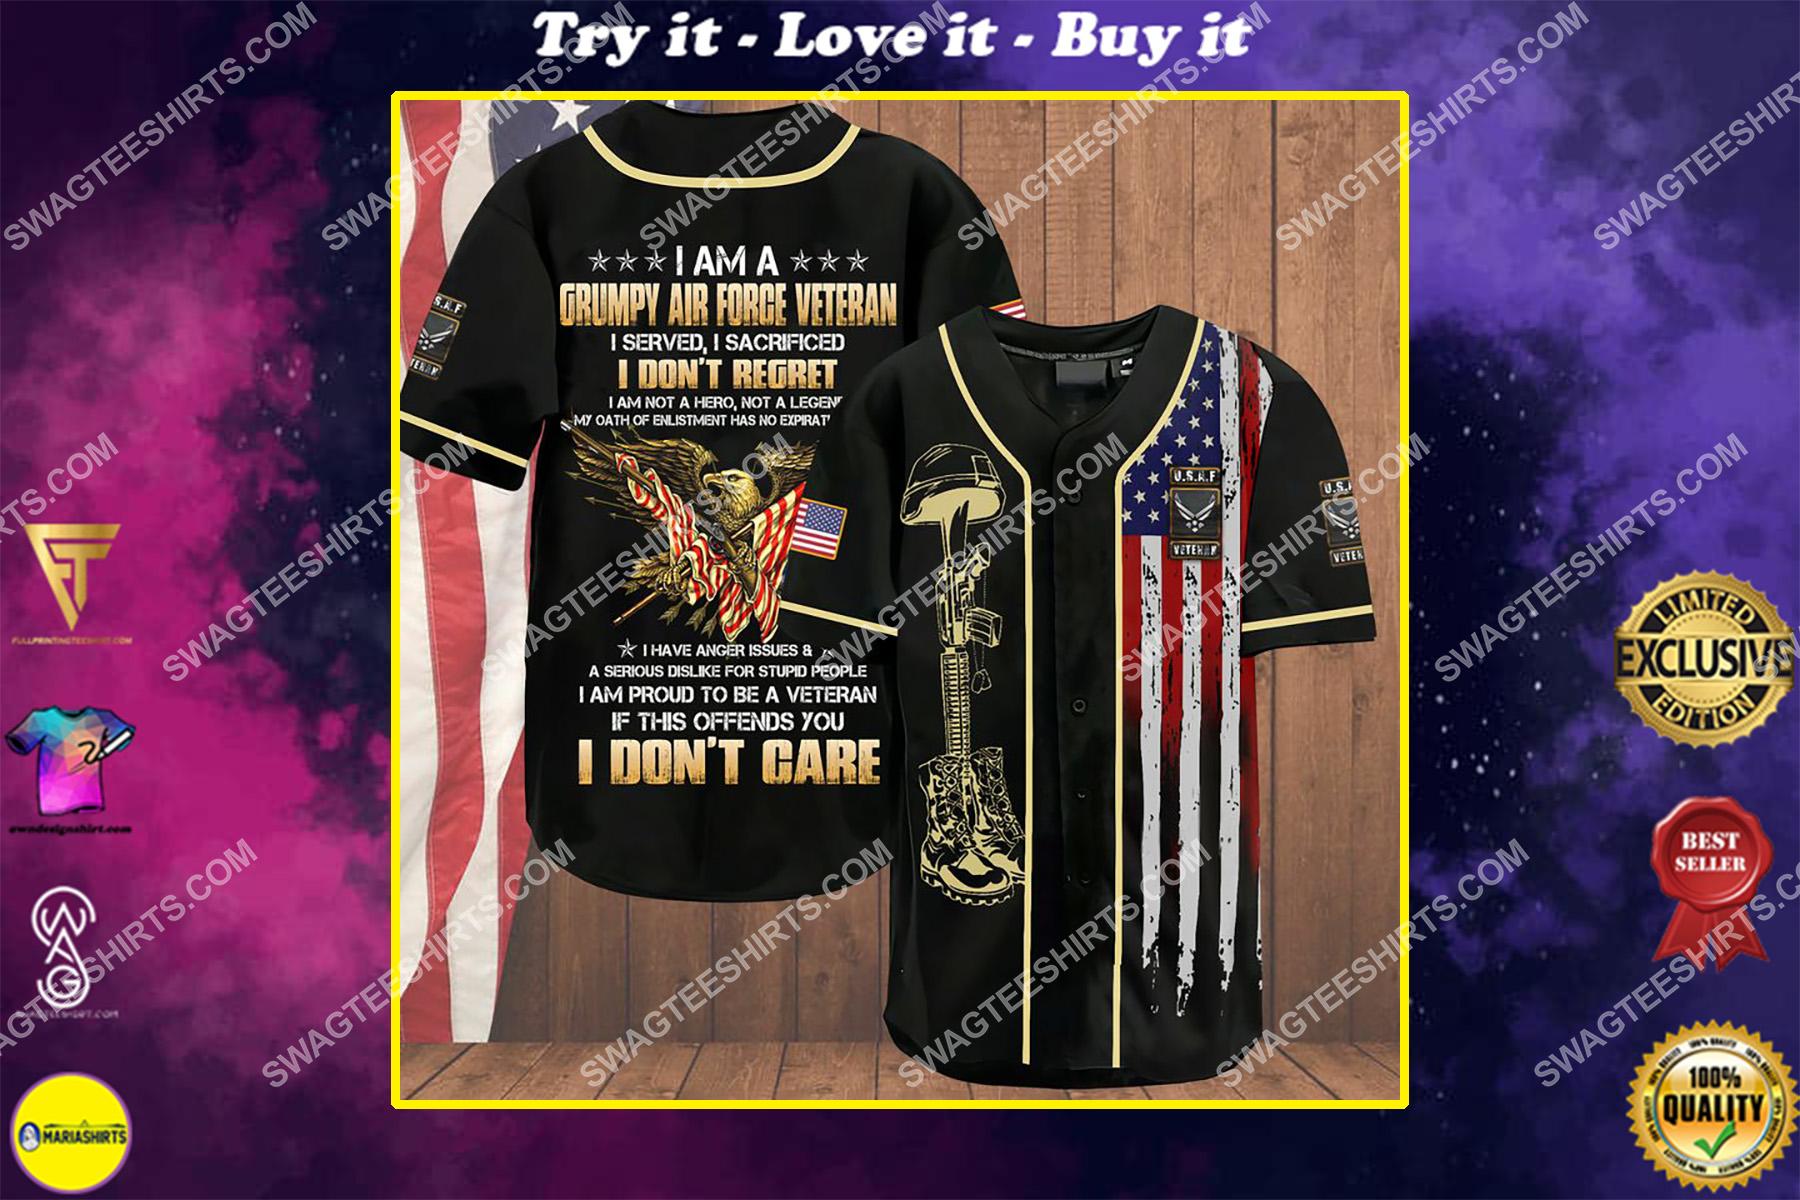 i am a grumpy old air force veteran i served i sacrificed i don't regret i am not a hero not a legend baseball shirt